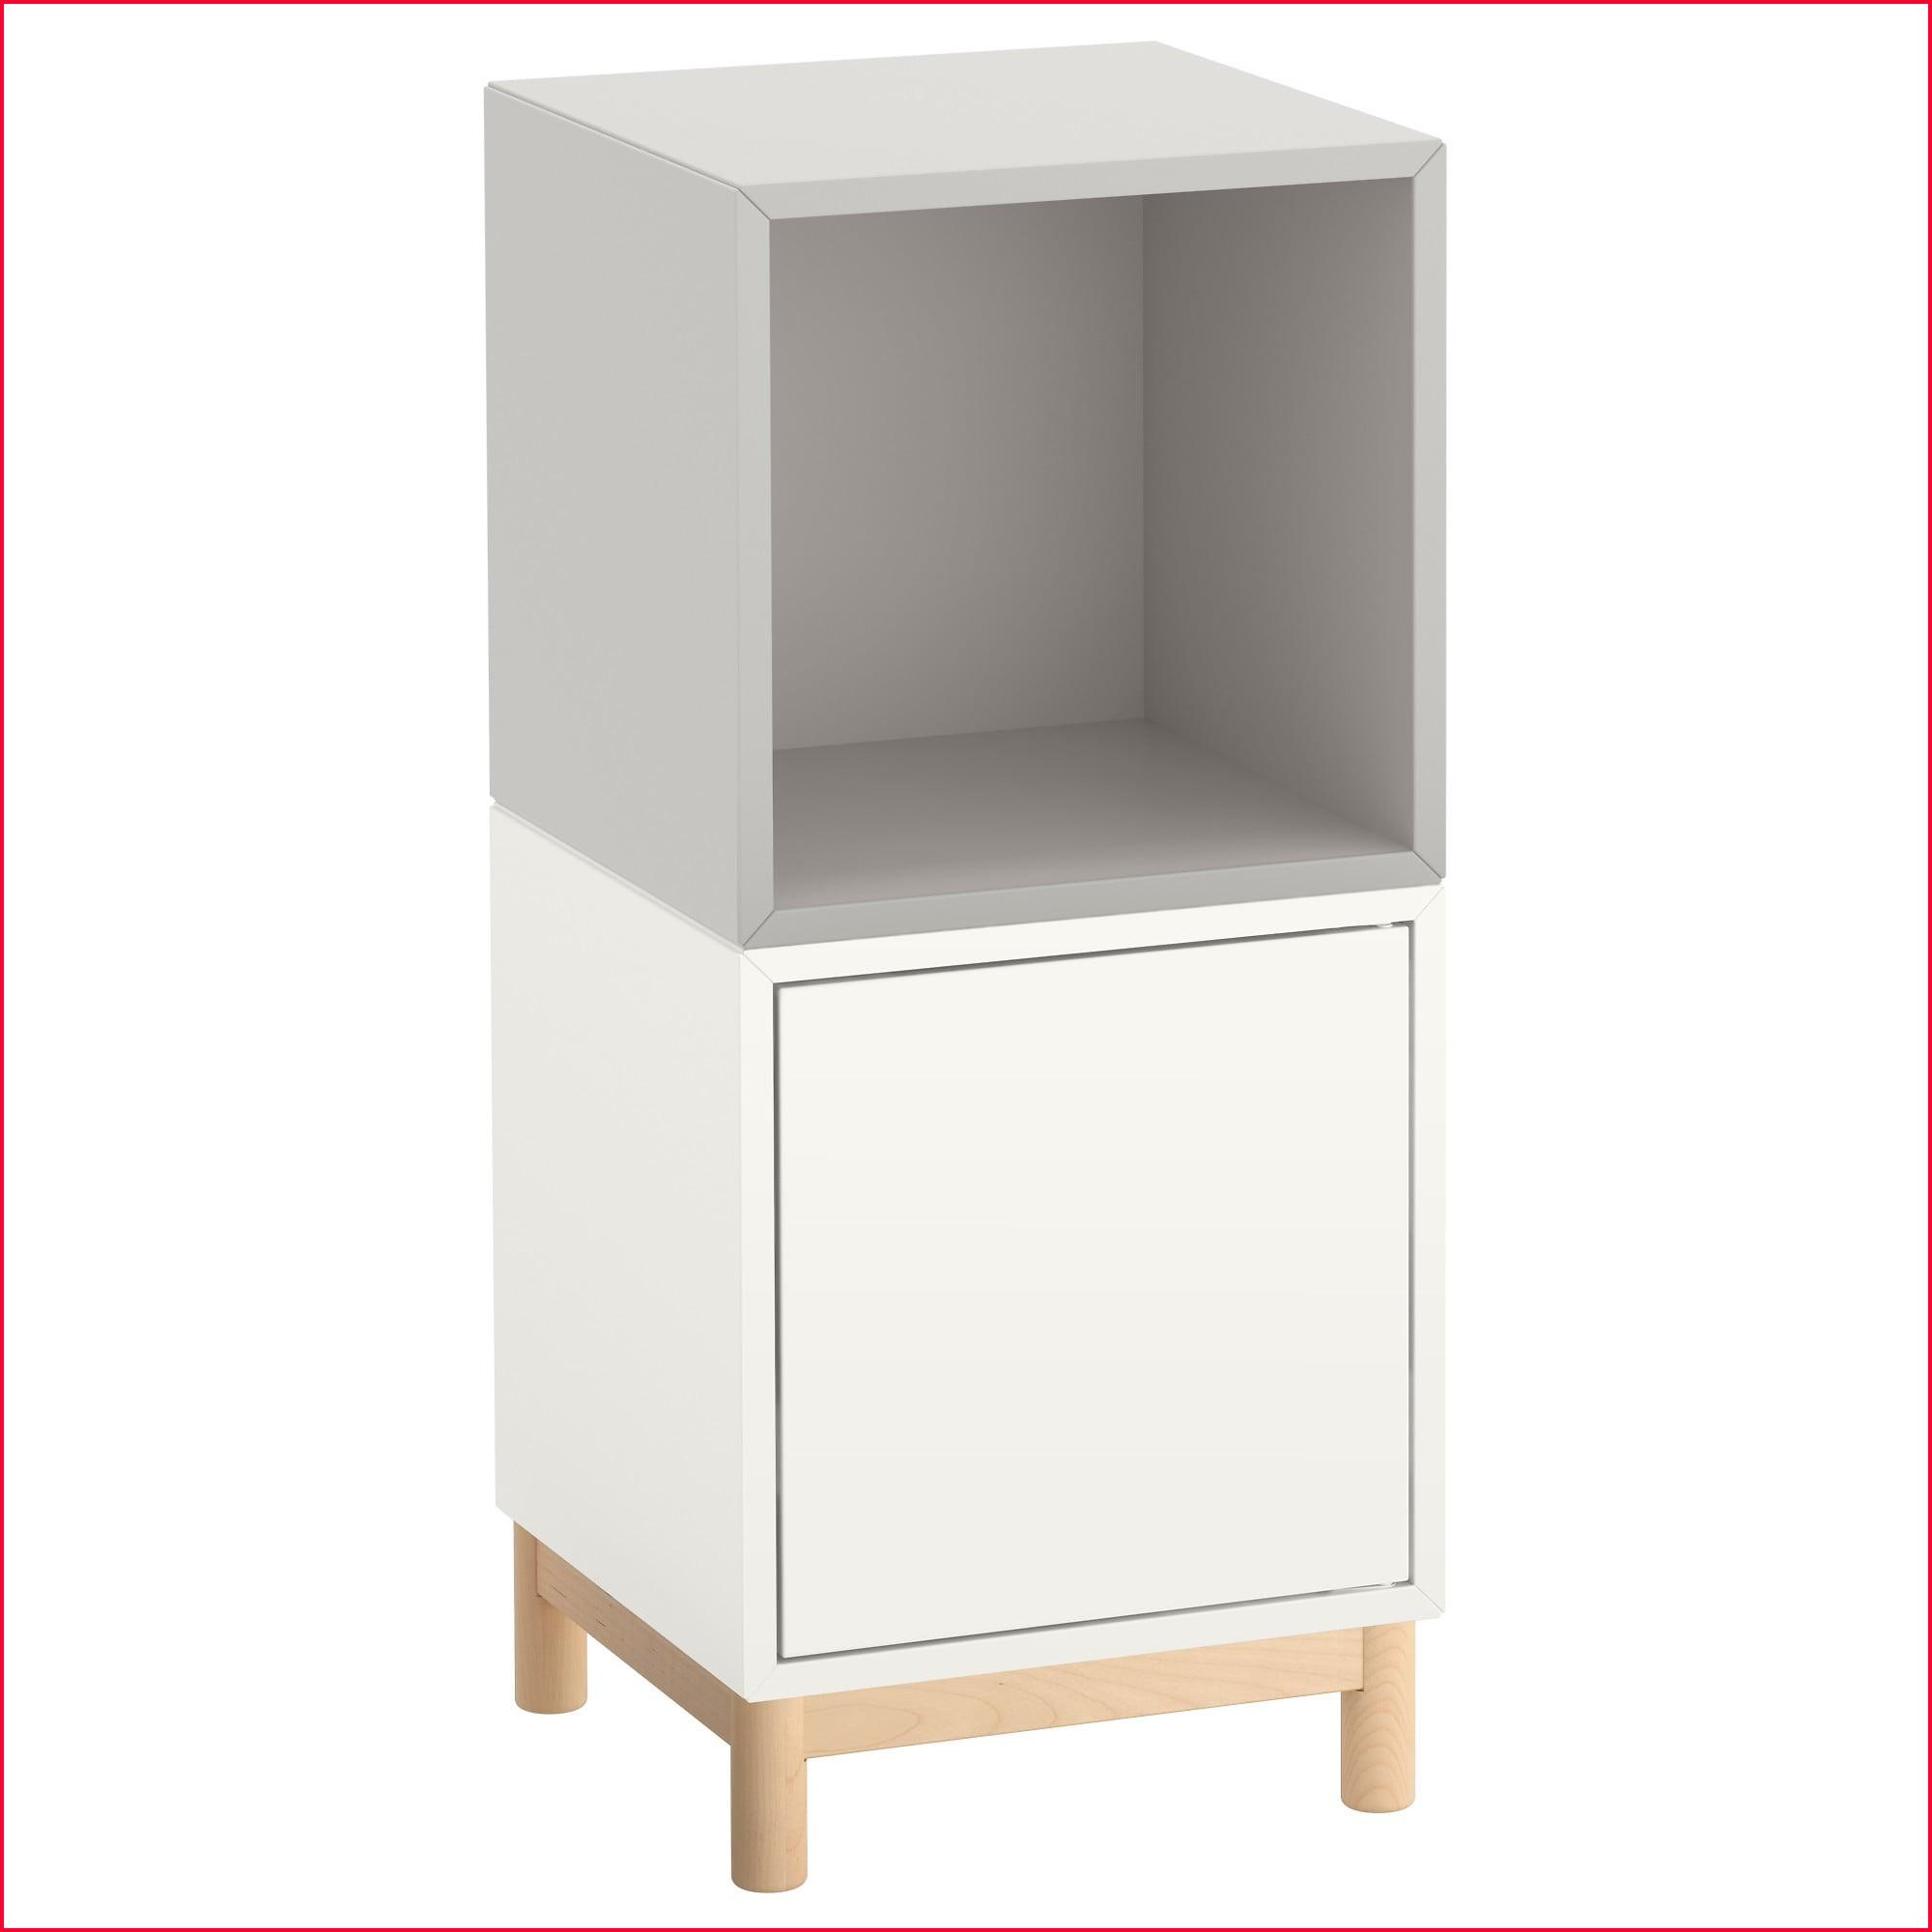 Armarios Ikea Niños E6d5 Muebles De Salà N Ikea Eket BinaciN Armario Patas Blanco Gris